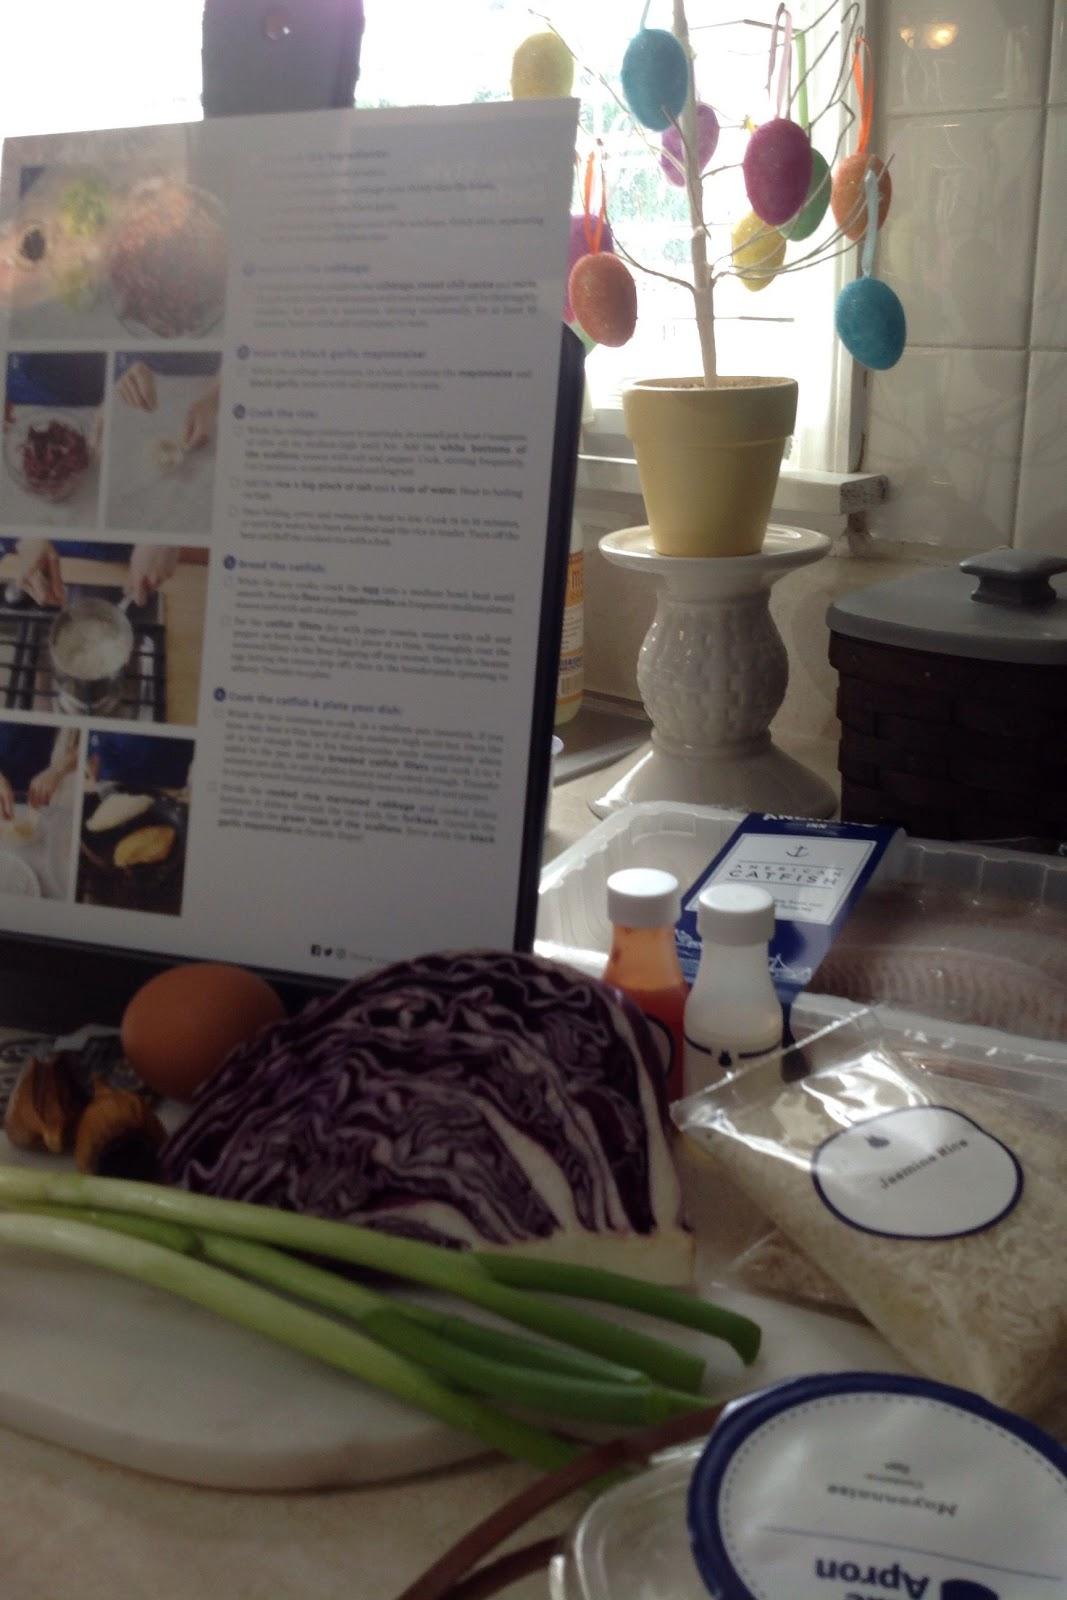 Blue apron katsu catfish - Katsu Style Catfish W Black Garlic Mayo Jasmine Rice